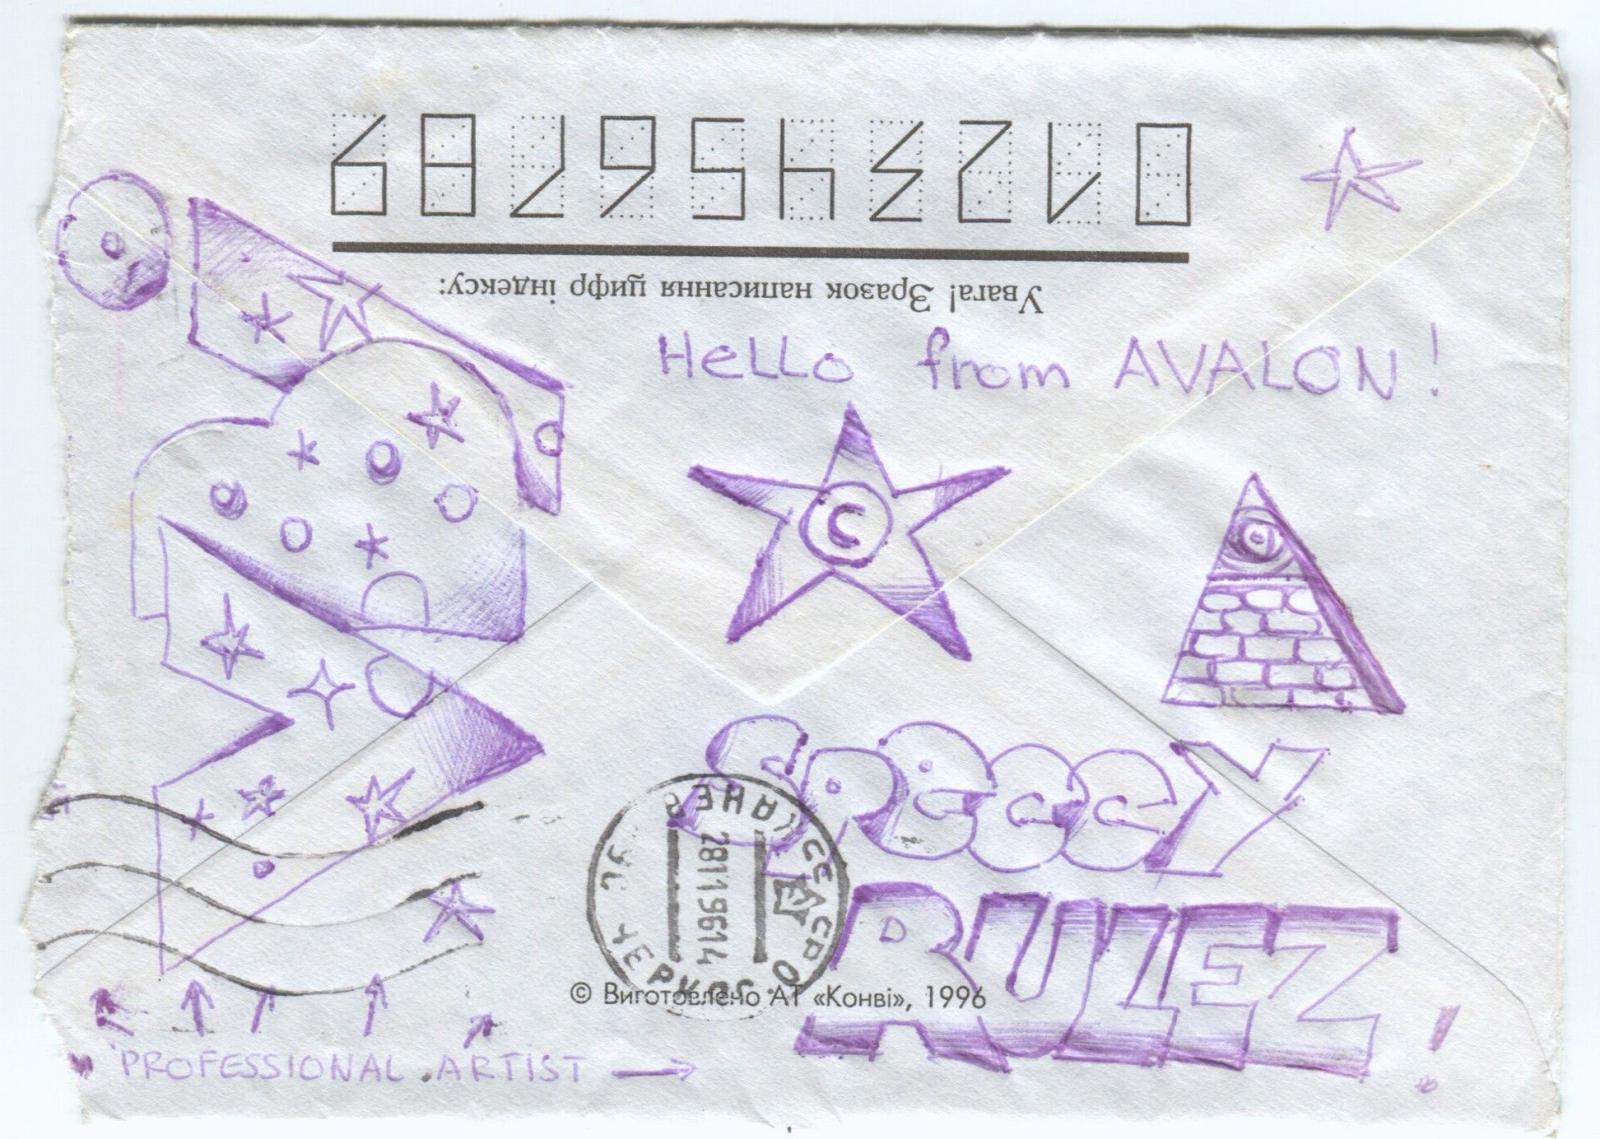 http://zxaaa.net/store/images/viator_to_vbi_19961128_0envelope.jpg